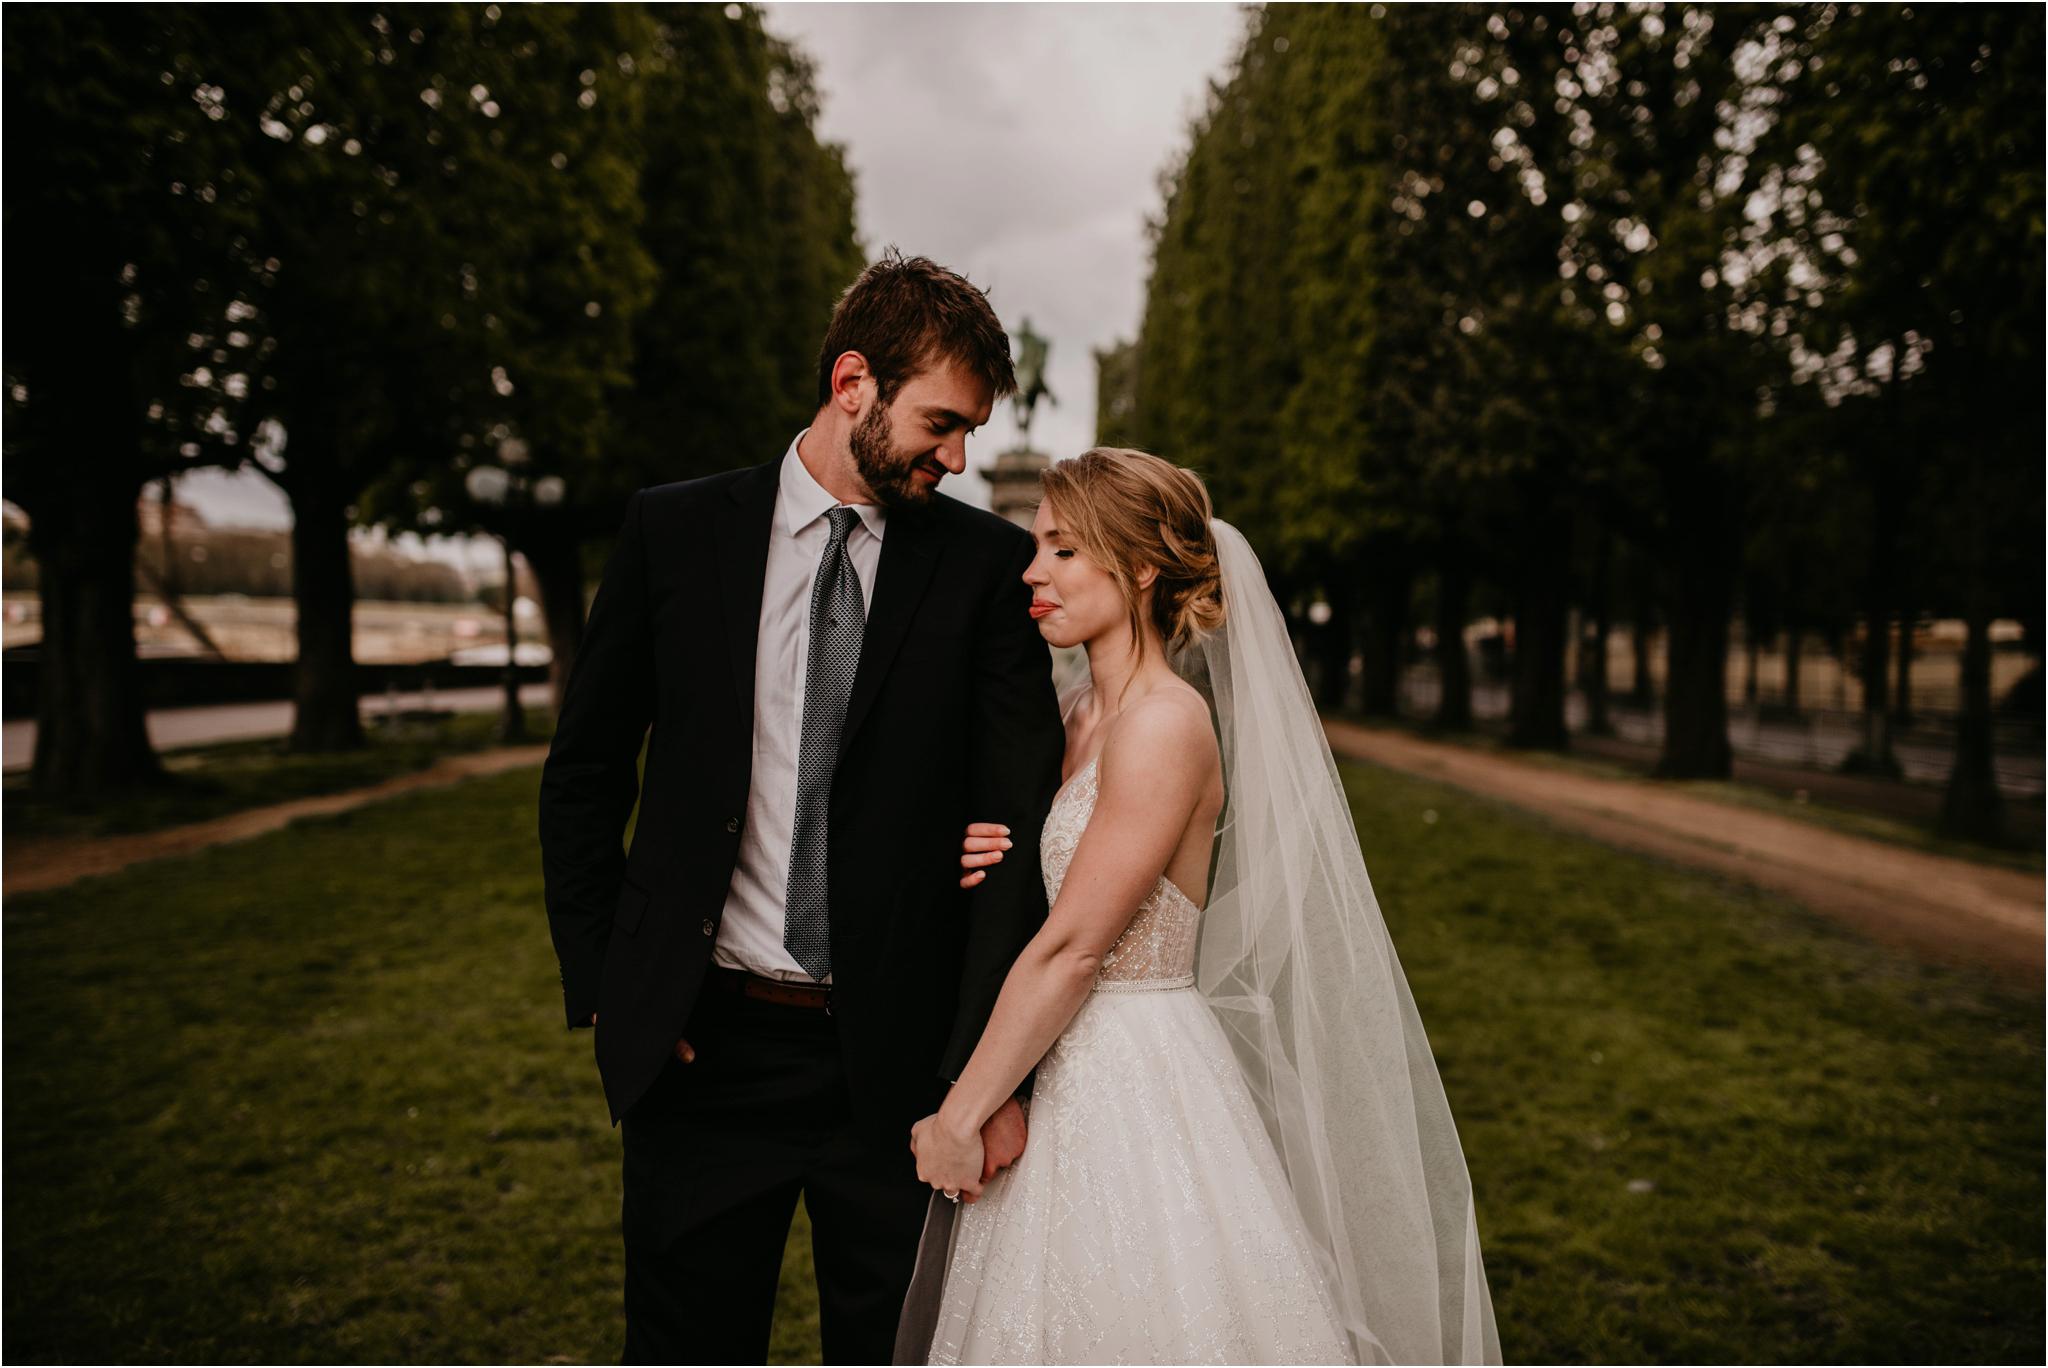 miranda-and-jared-paris-elopement-destination-wedding-photographer-046.jpg